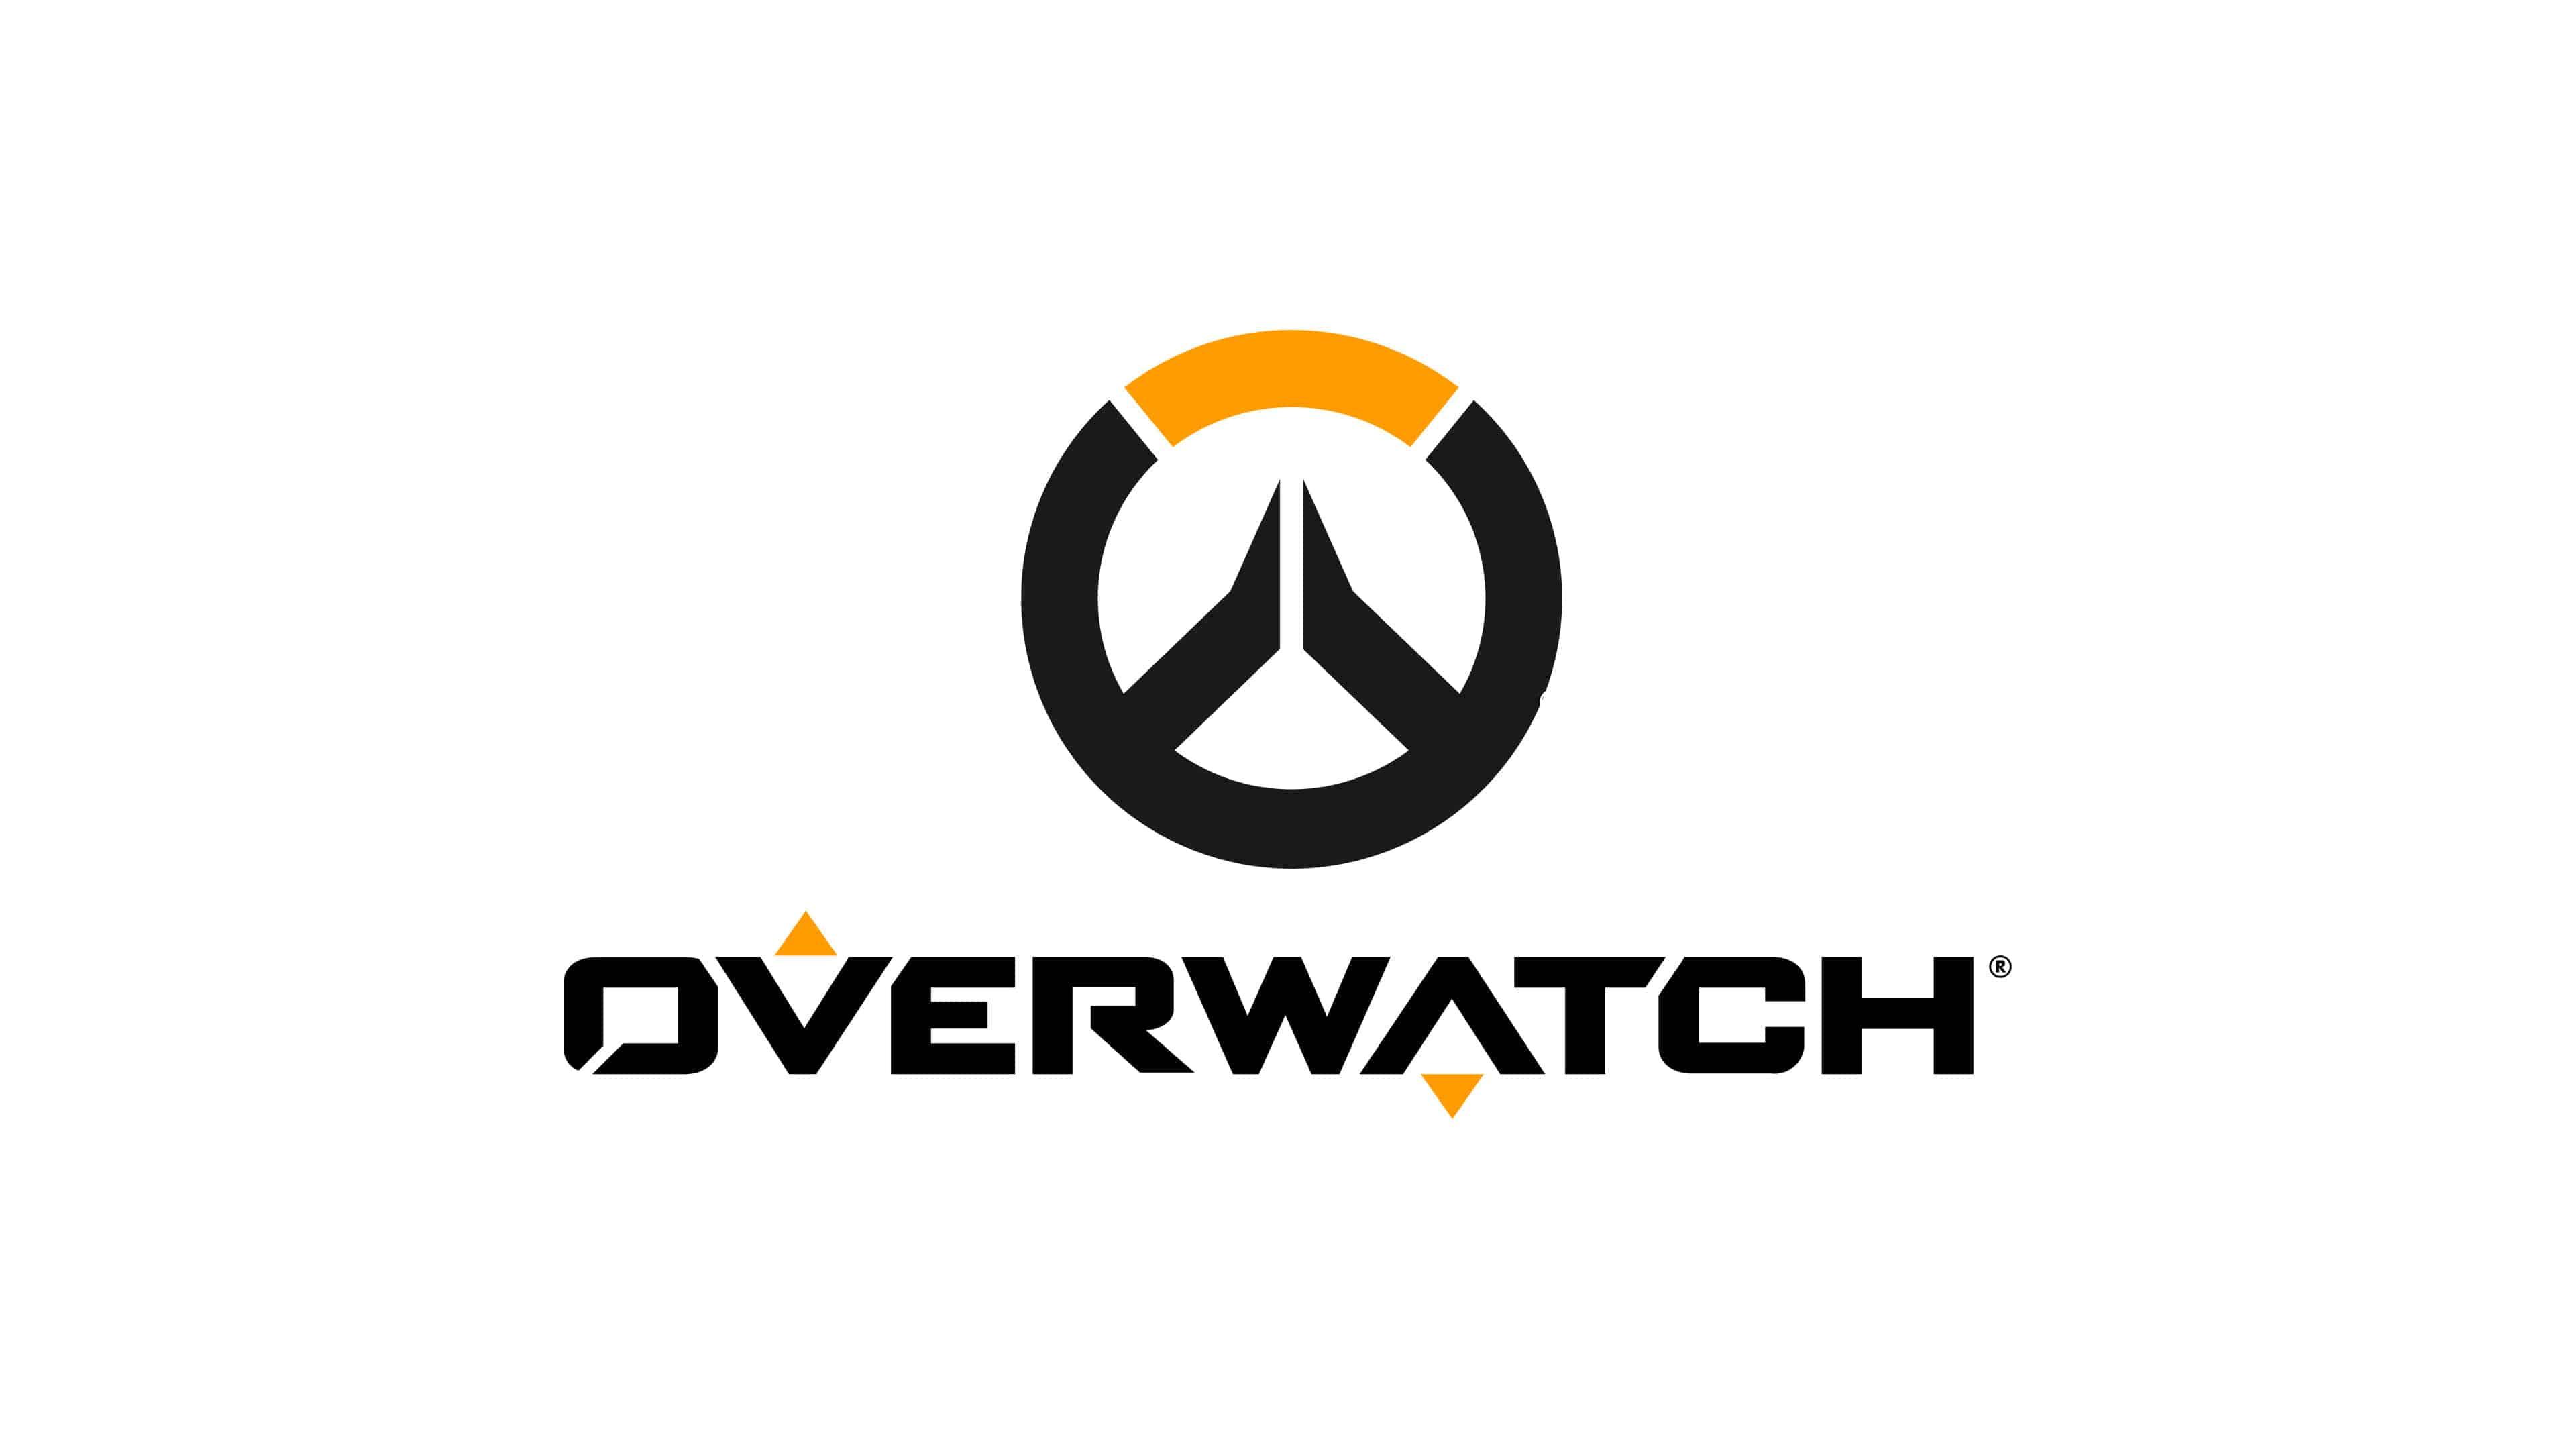 24 Overwatch Logo Wallpapers On Wallpapersafari